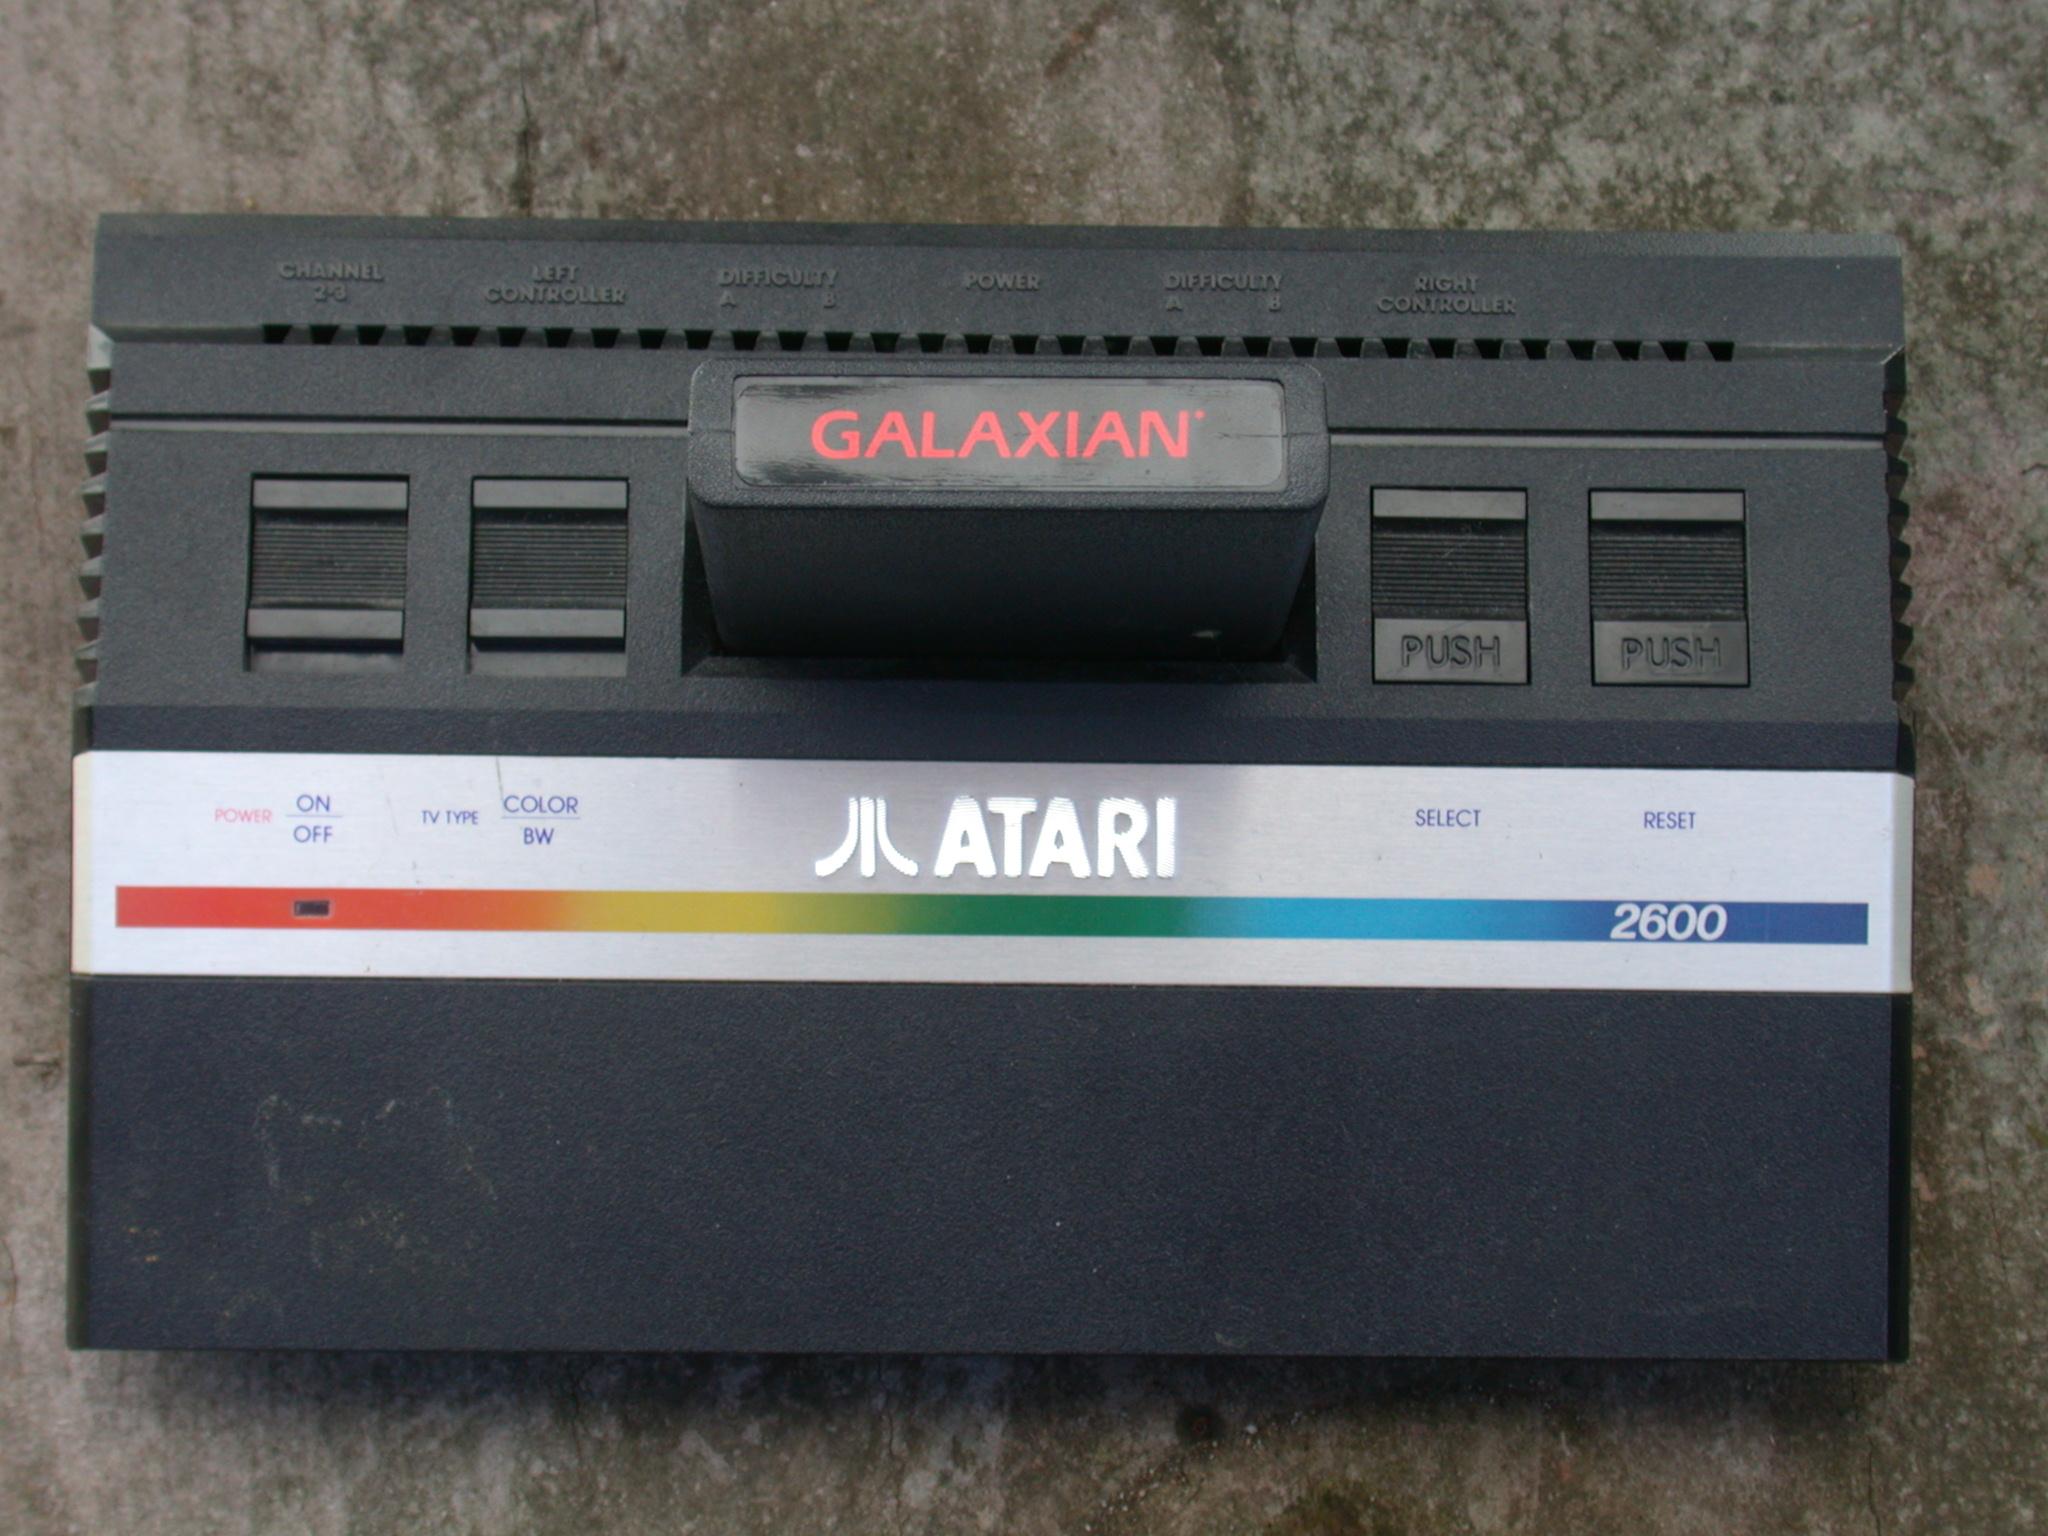 atari 2600 classic gaming console galaxian cartridge seventies eighties 70s 80s